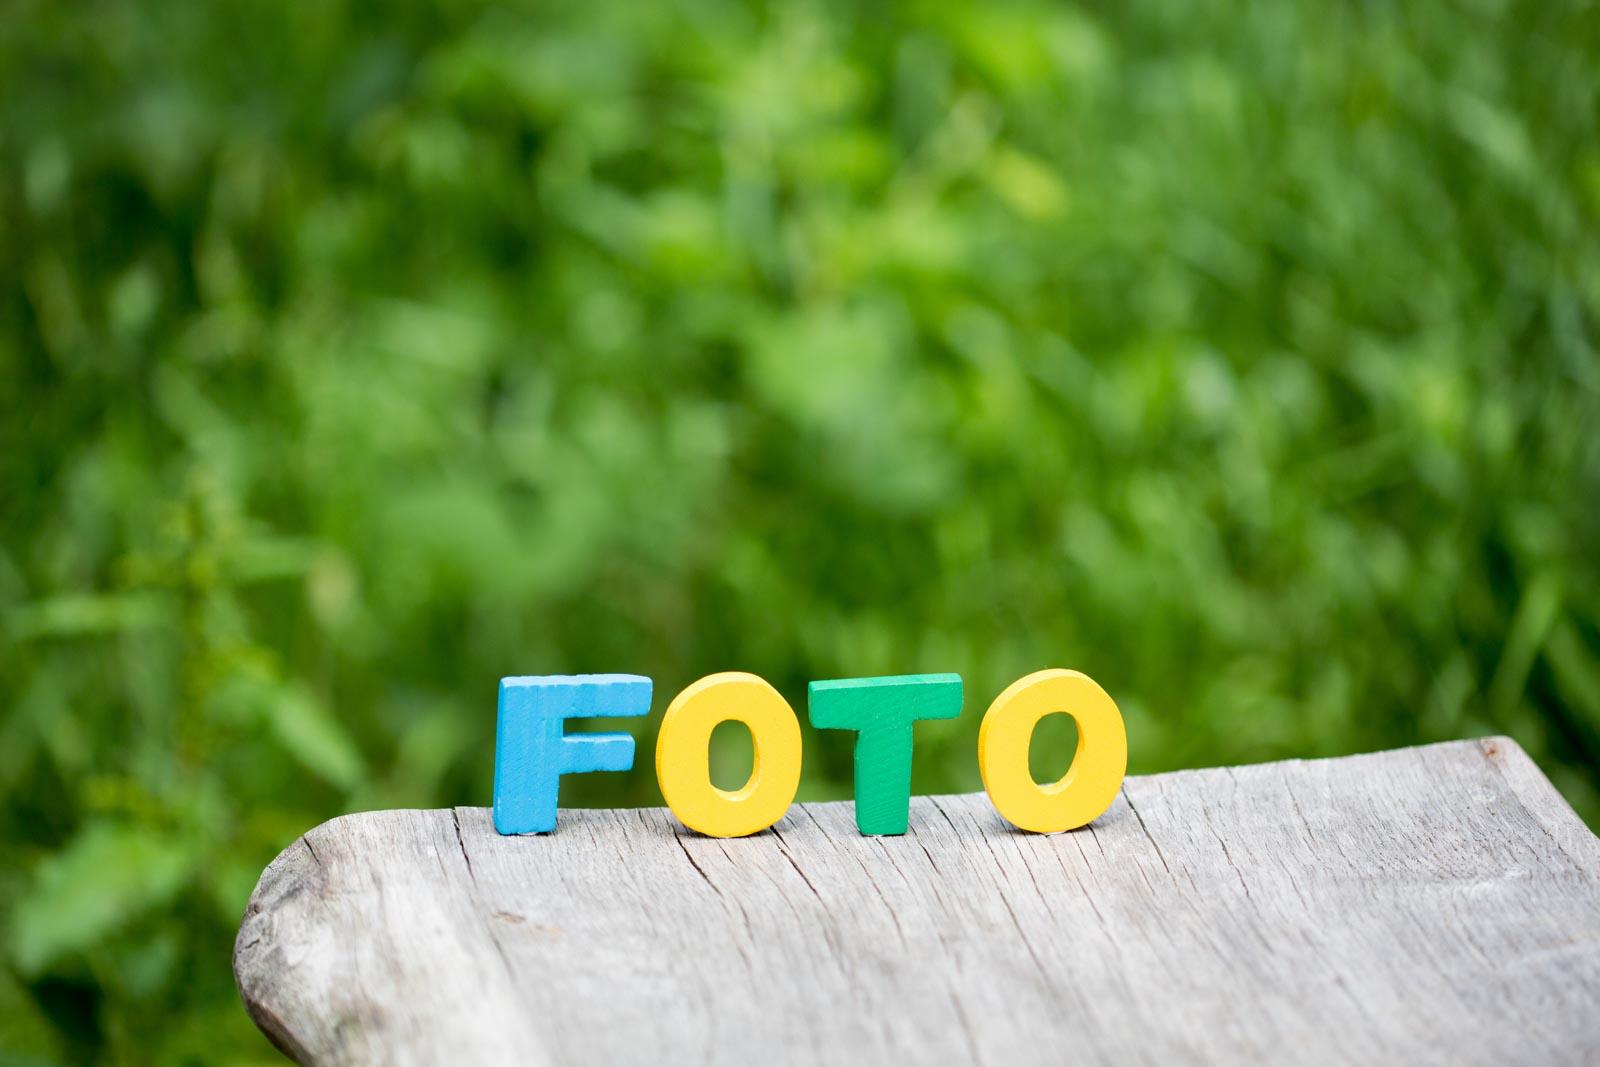 Houten letters die het woord foto vormen